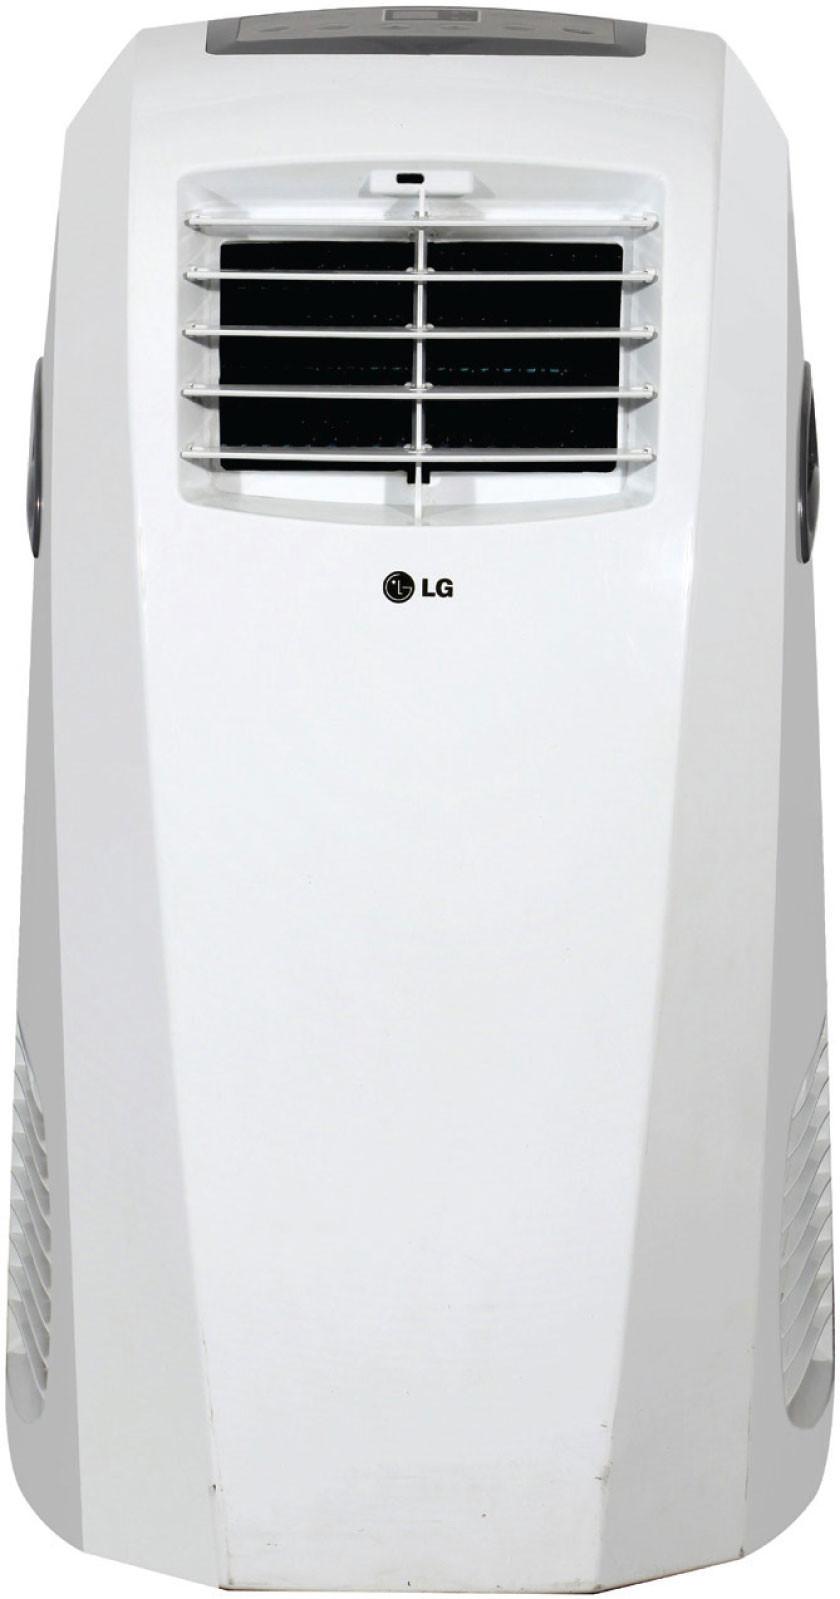 LG 10,000 BTU Portable Air Conditioner